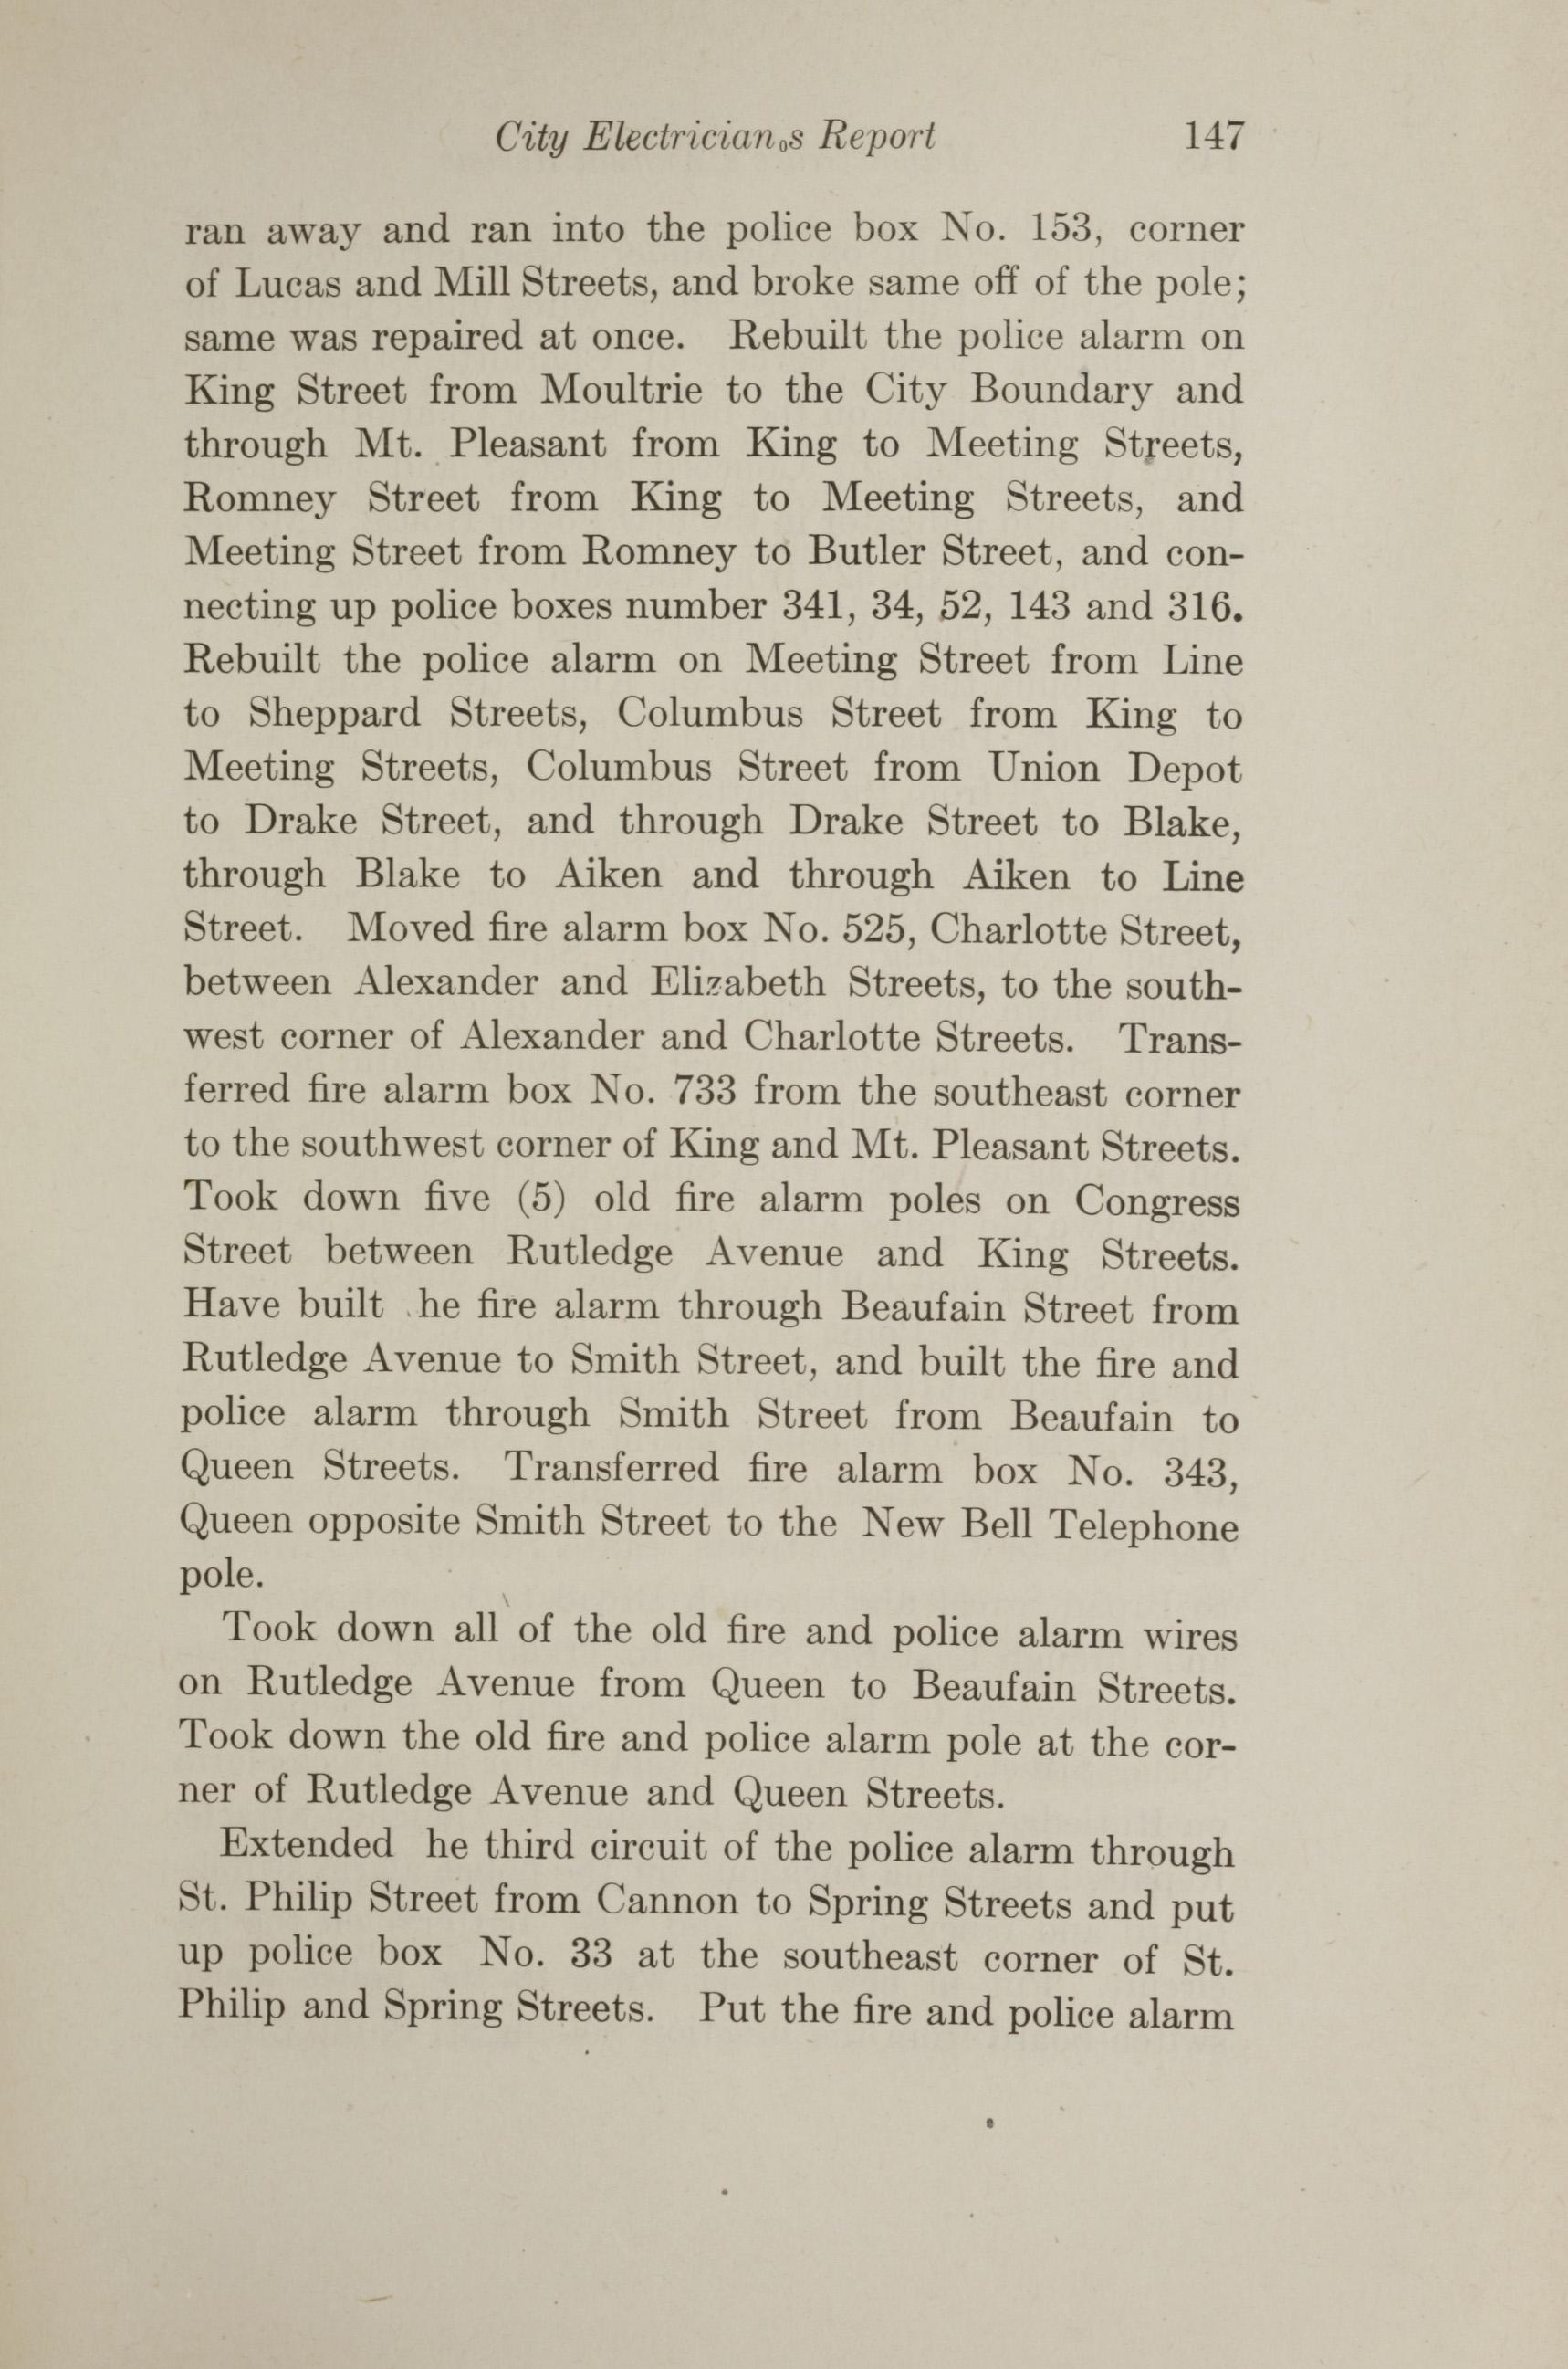 Charleston Yearbook, 1912, page 147